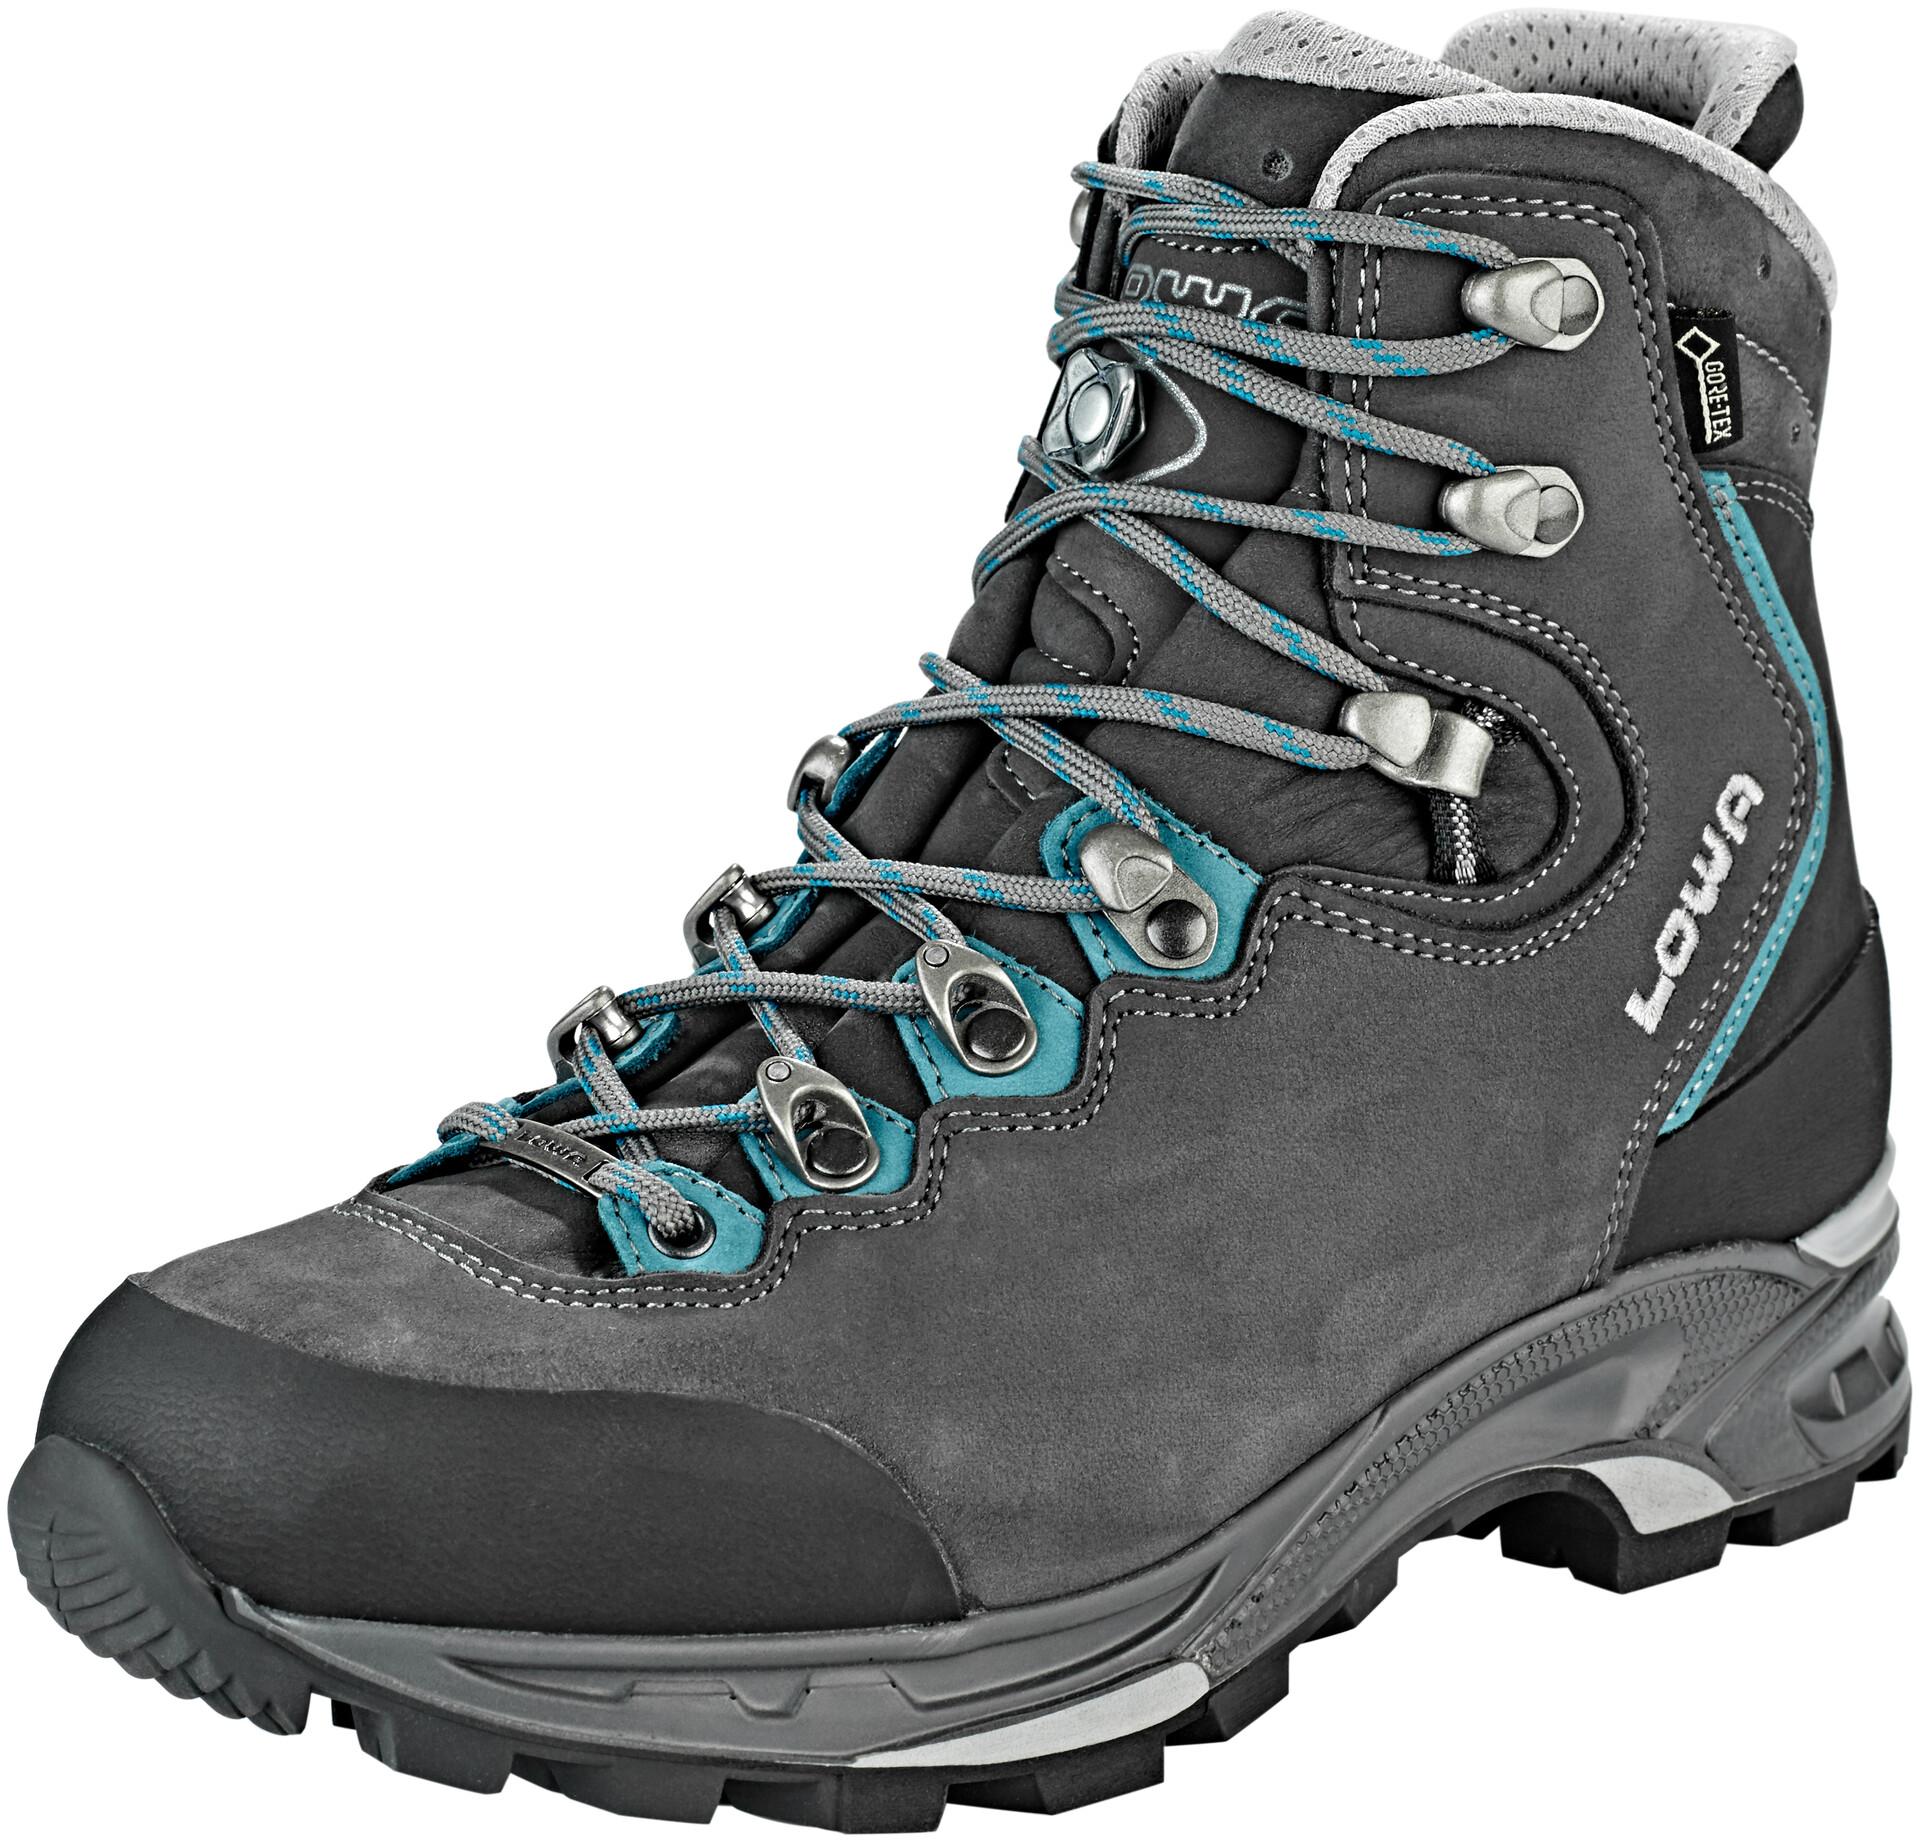 Lowa Mauria GTX Chaussures de trekking Femme, anthracitepetrol